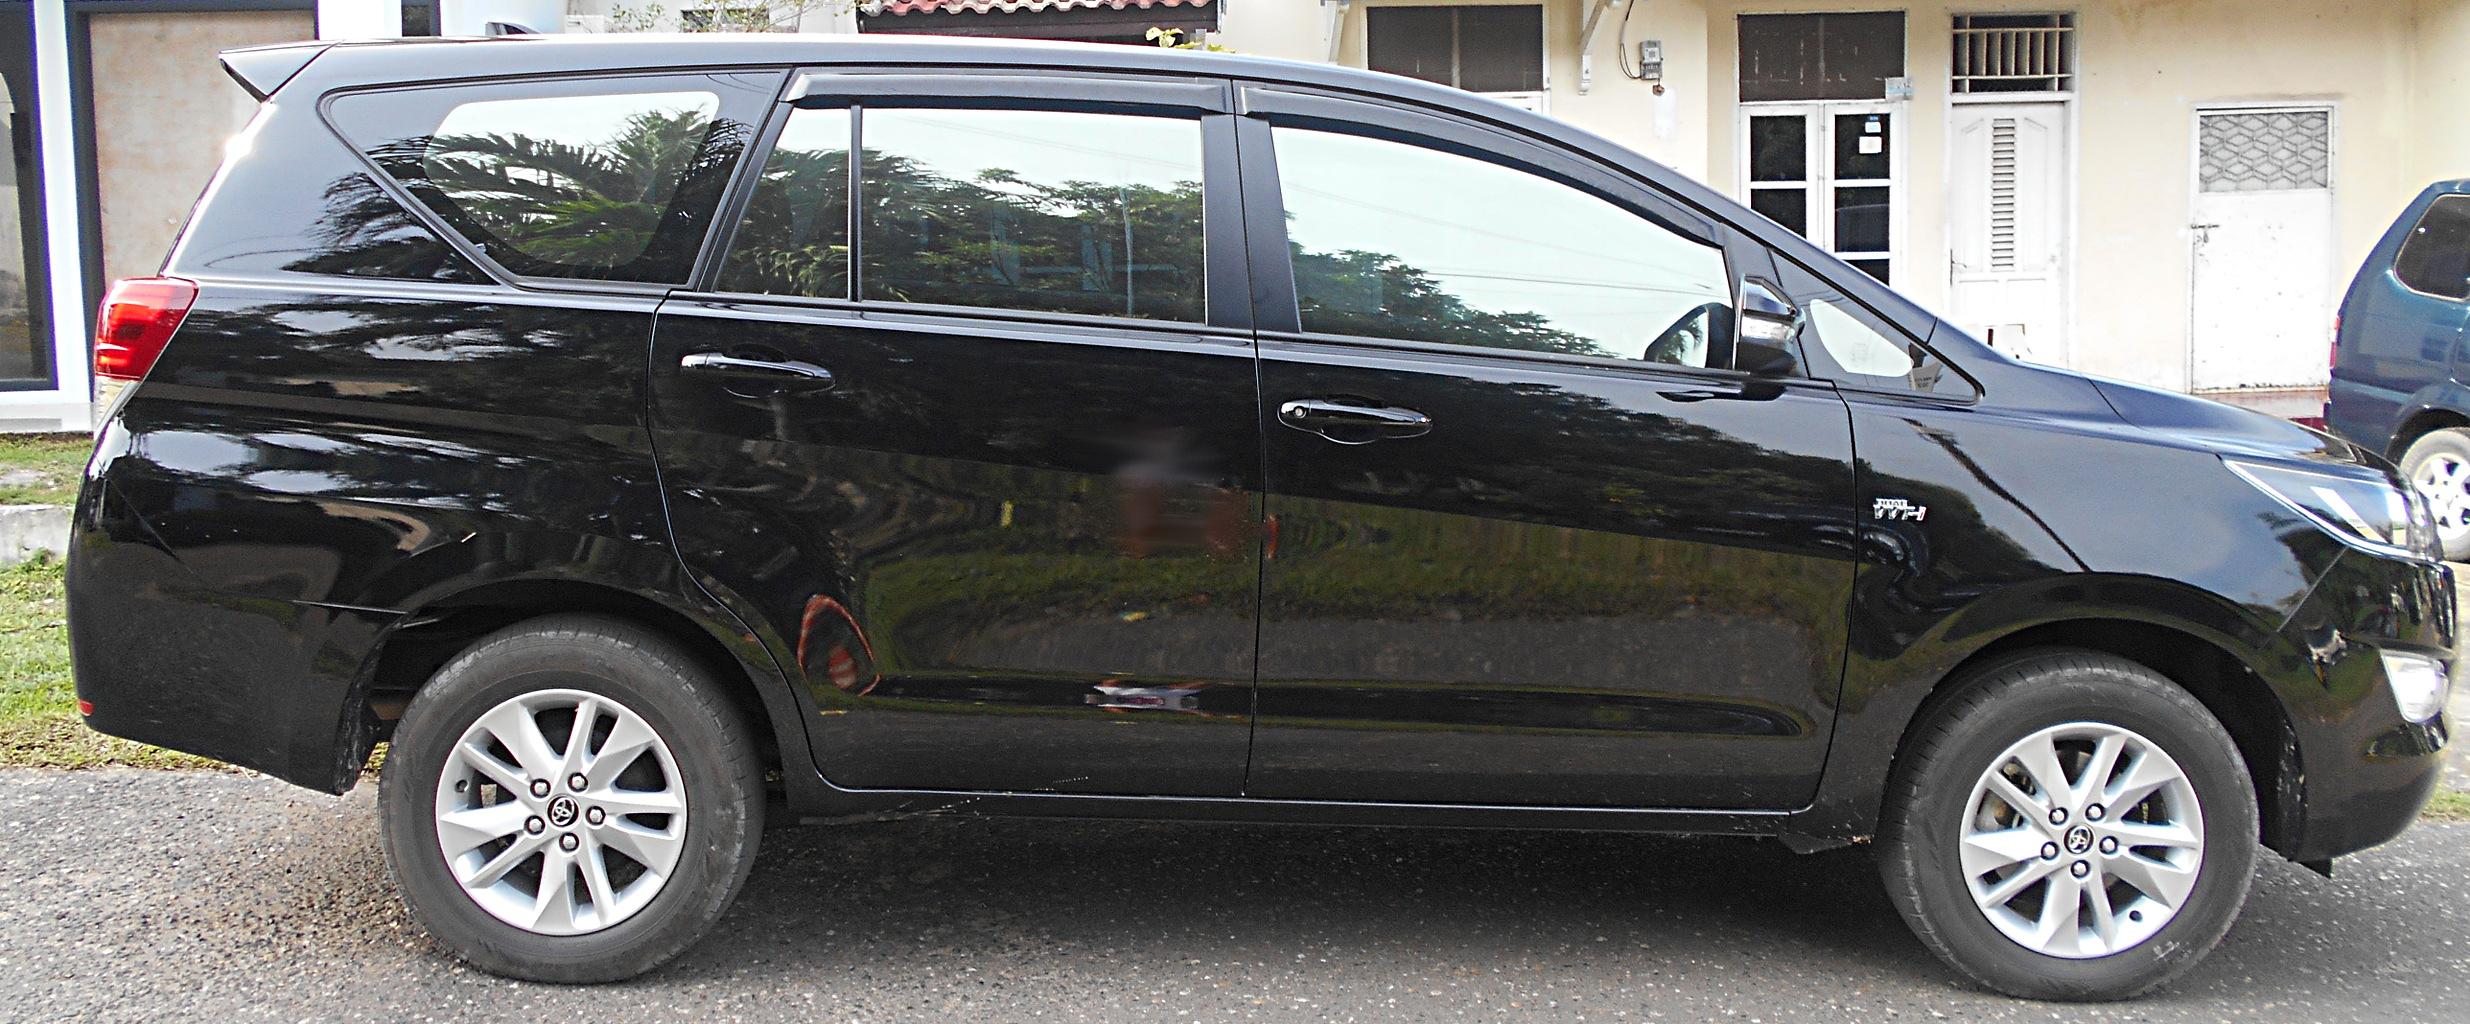 File:2015 Toyota Kijang Innova, Jambi